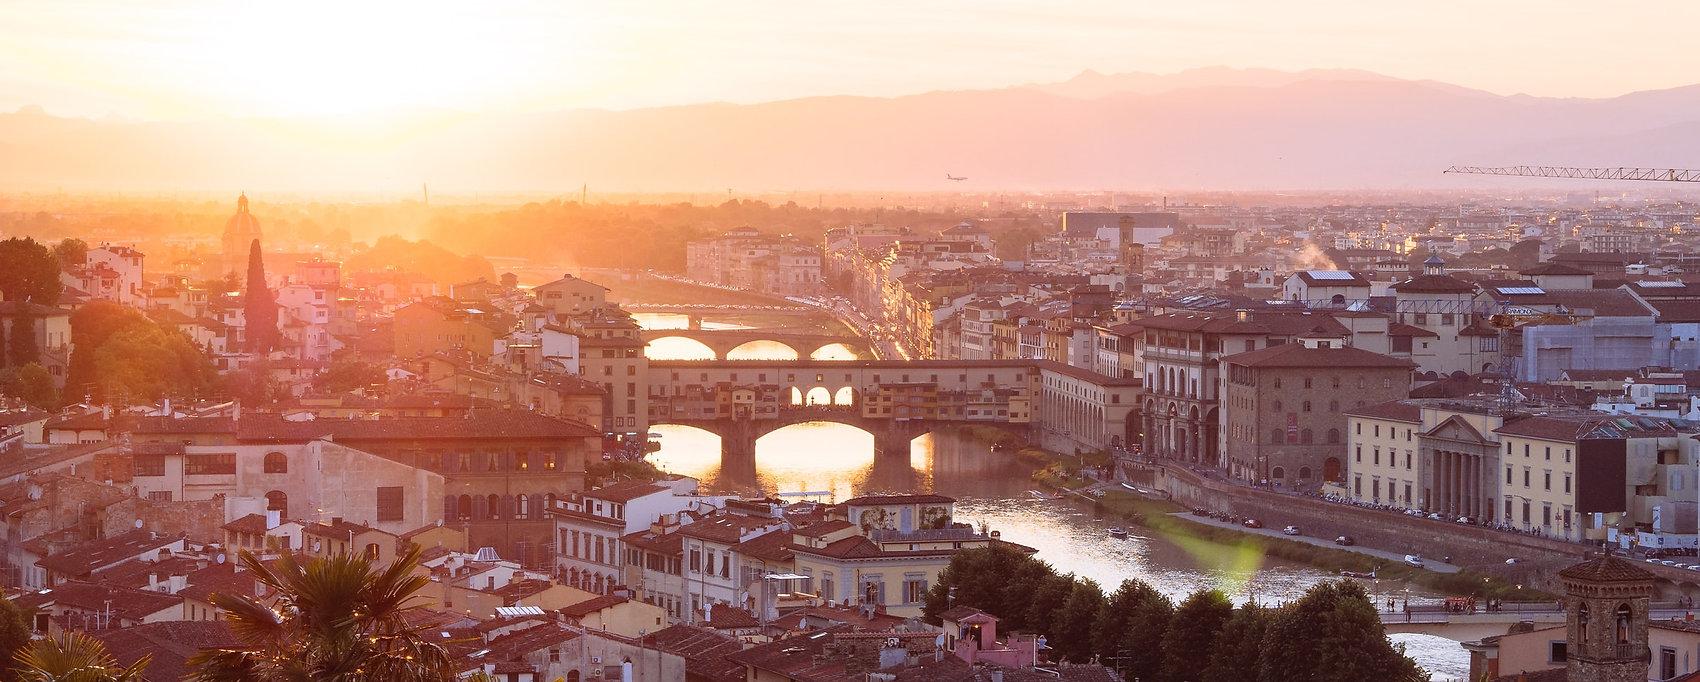 Pauschalreisen - Europa - Italien - Flor